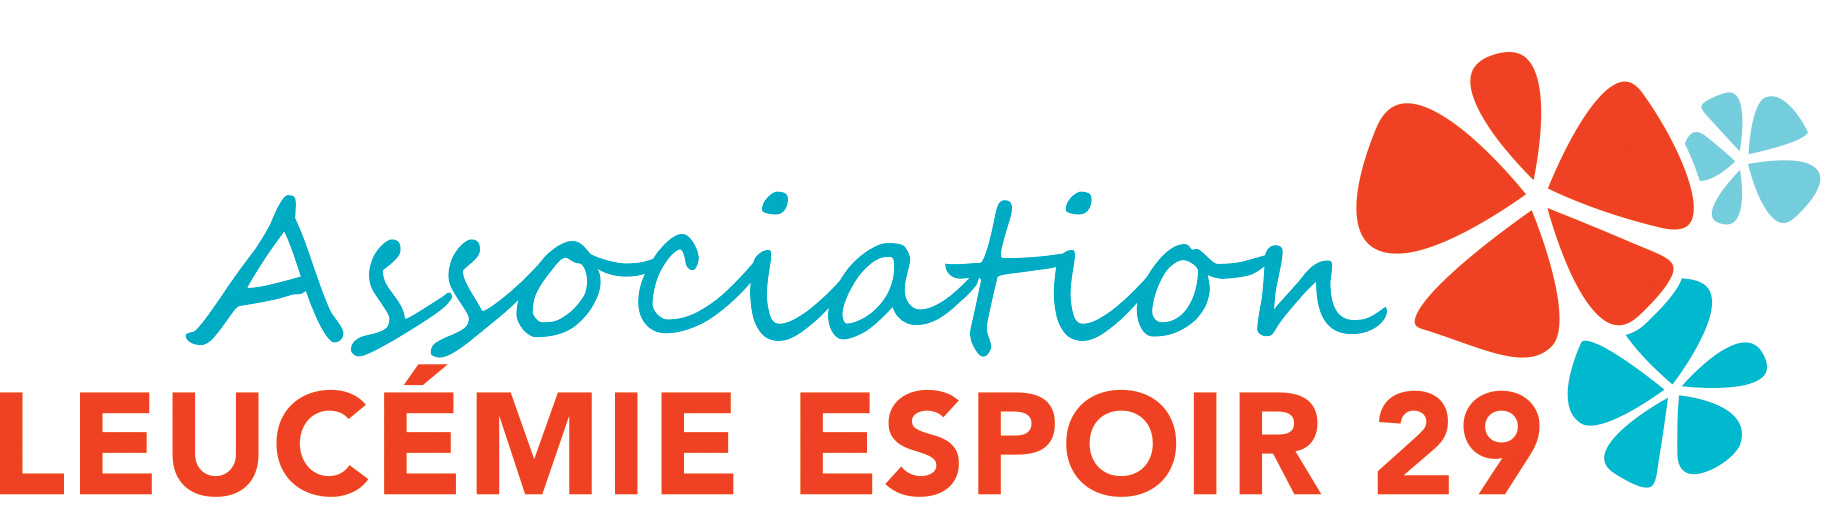 Association ASSOCIATION CELINE ET STEPHANE LEUCÉMIE ESPOIR 29